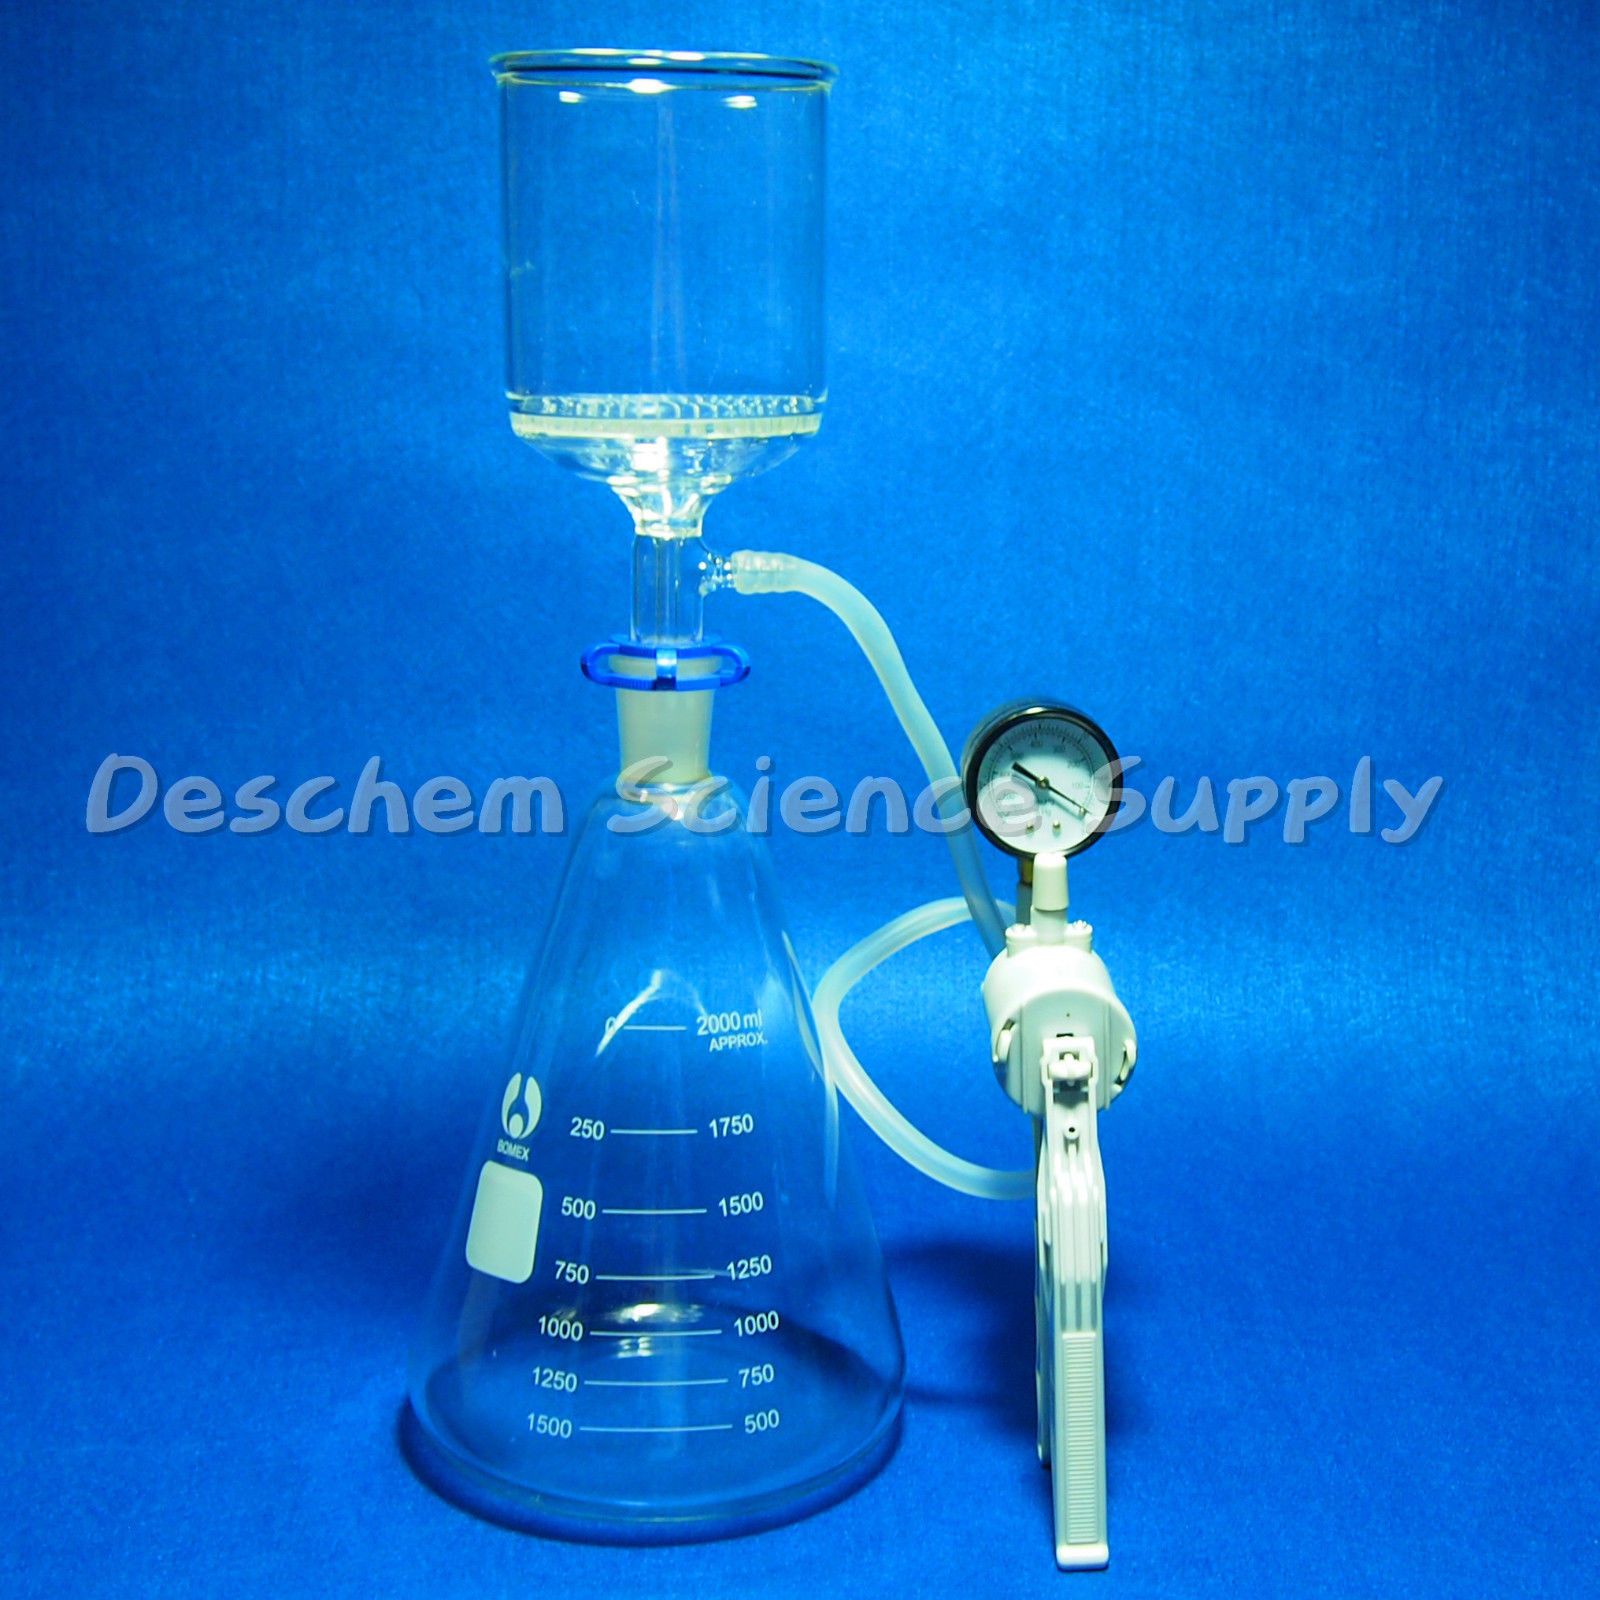 top 10 filtration buchner funnel kit brands and get free